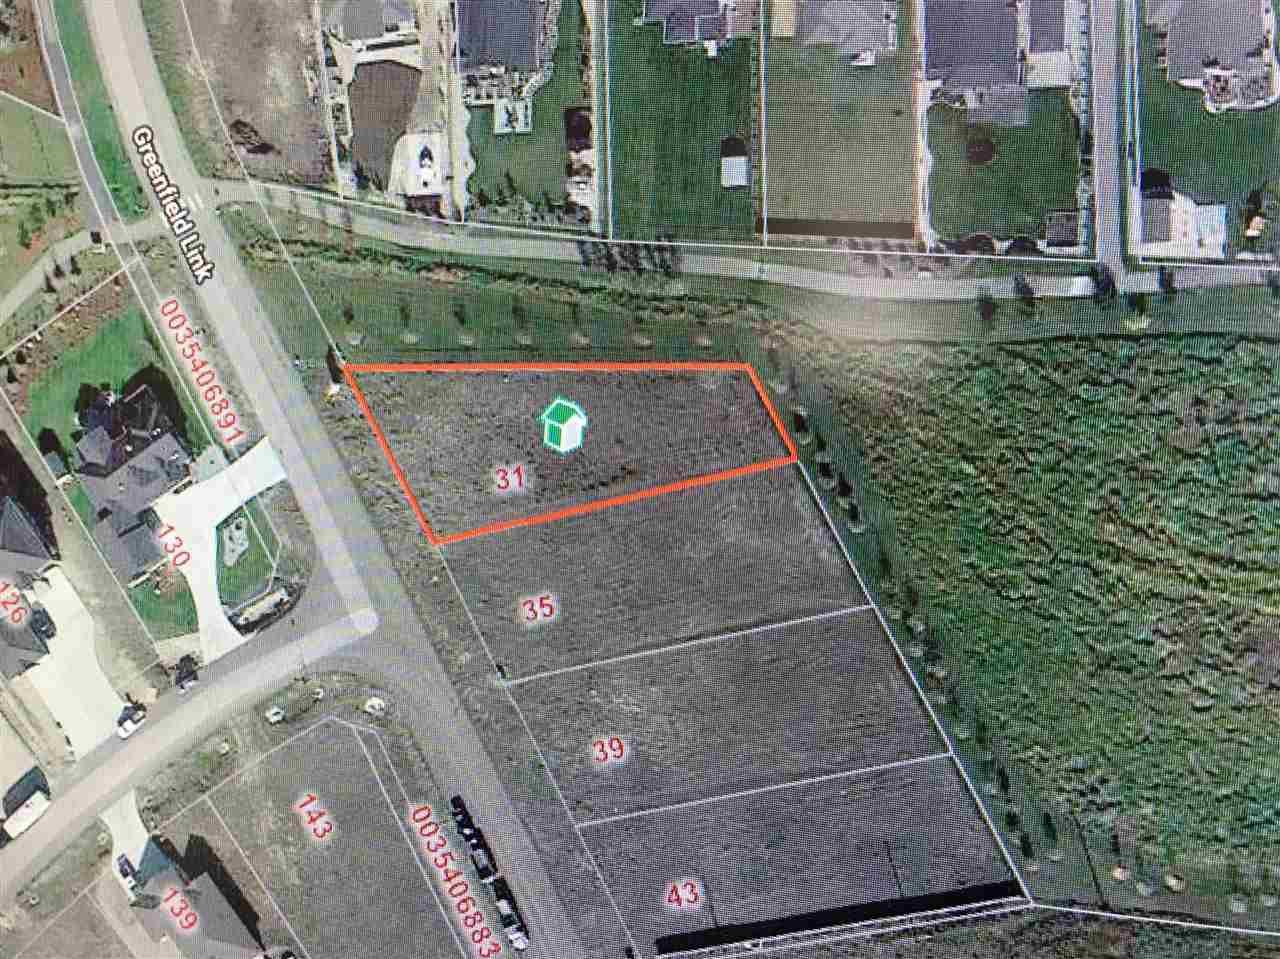 Main Photo: 31 GREENFIELD Link: Fort Saskatchewan Vacant Lot for sale : MLS®# E4128533